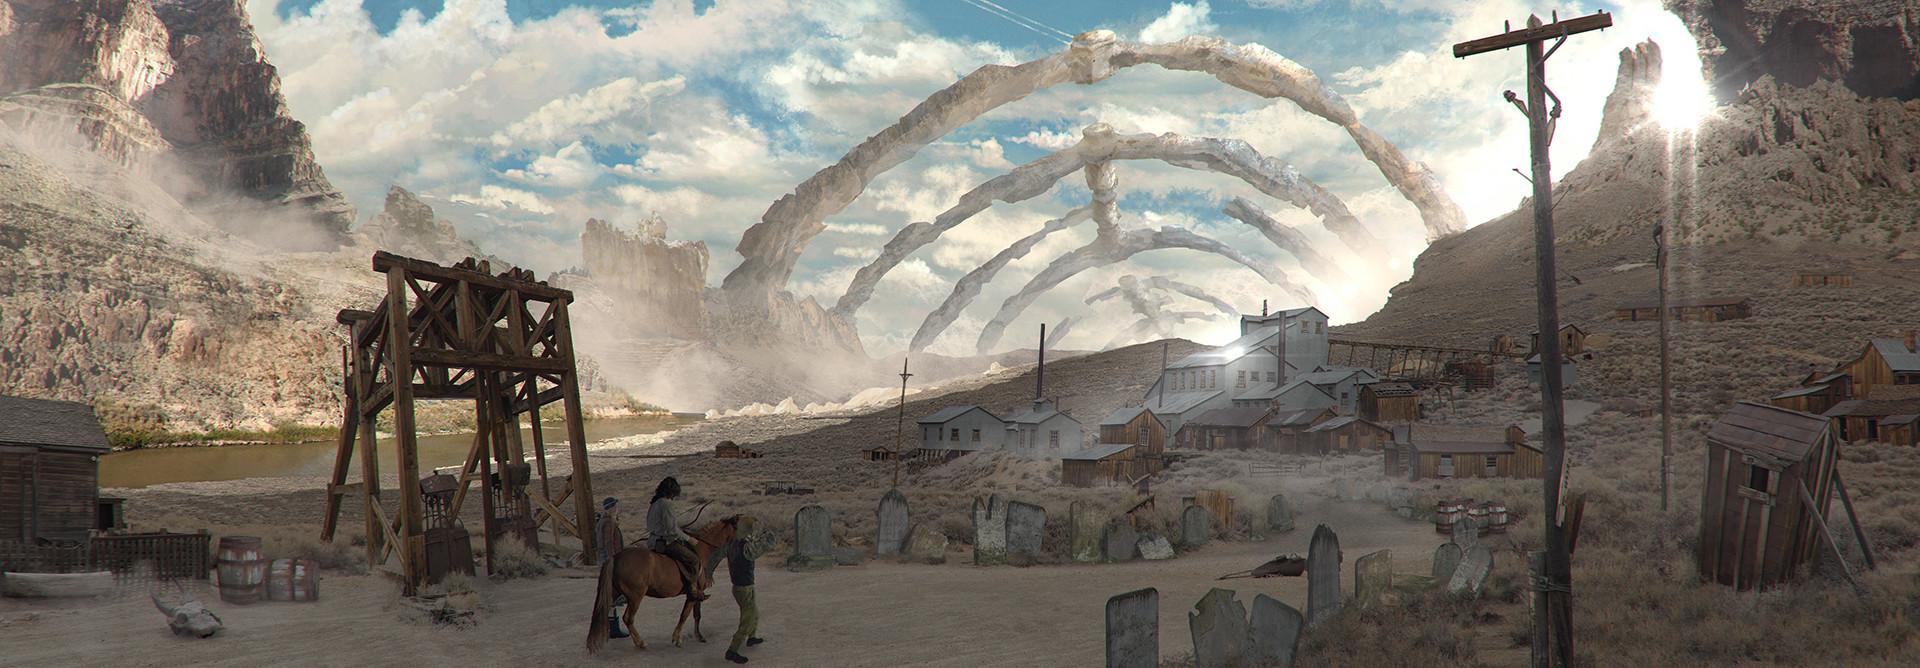 Saverio solari ghost town